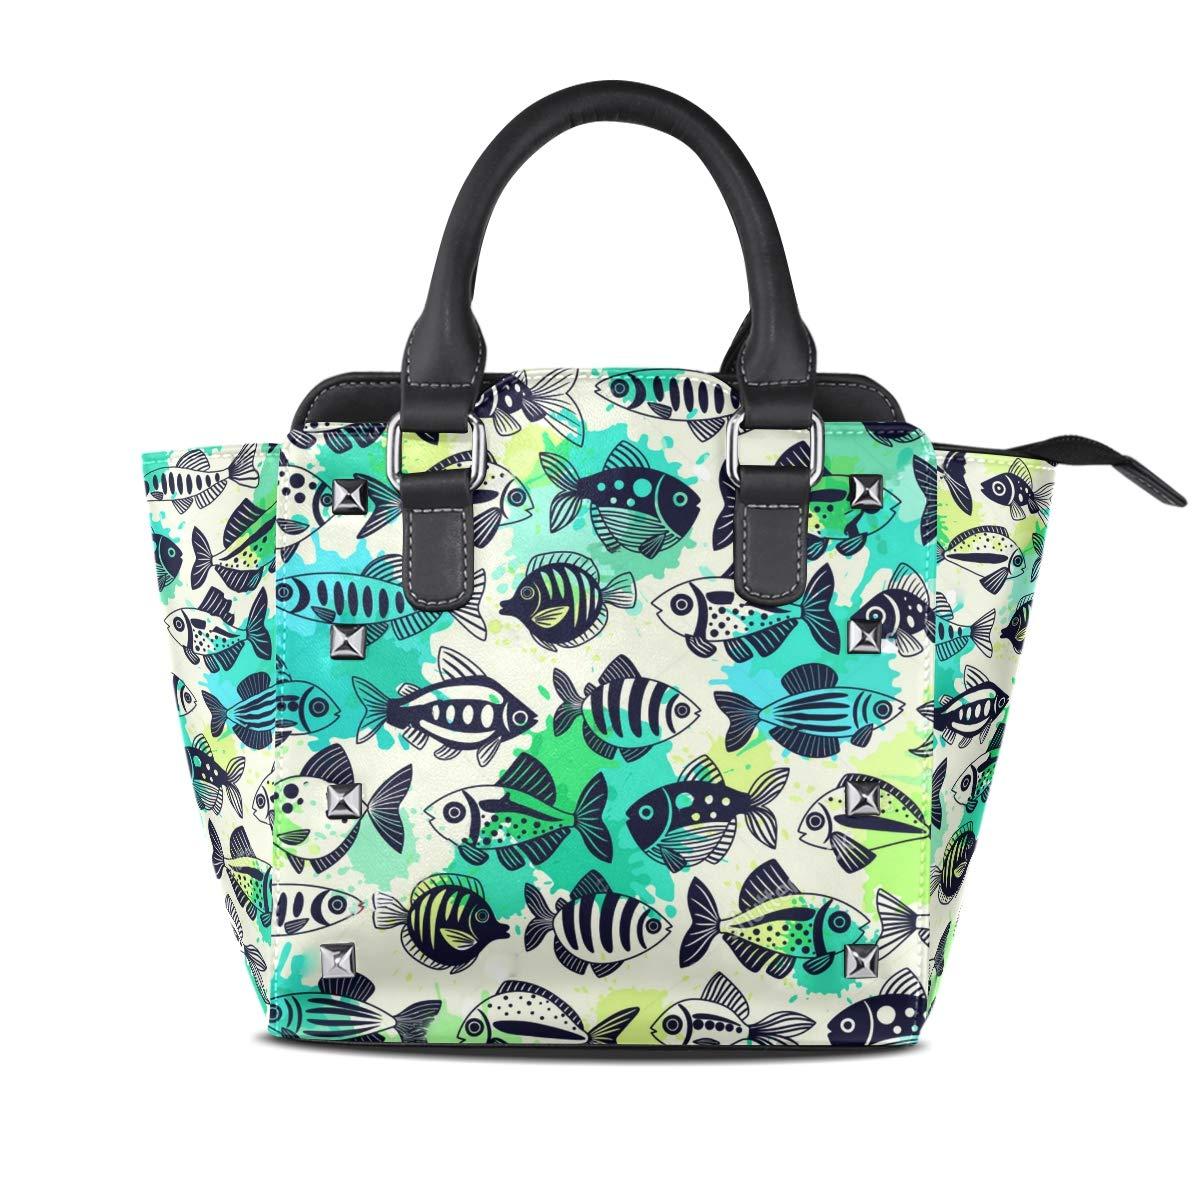 Design2 Handbag Skull Yellow Genuine Leather Tote Rivet Bag Shoulder Strap Top Handle Women